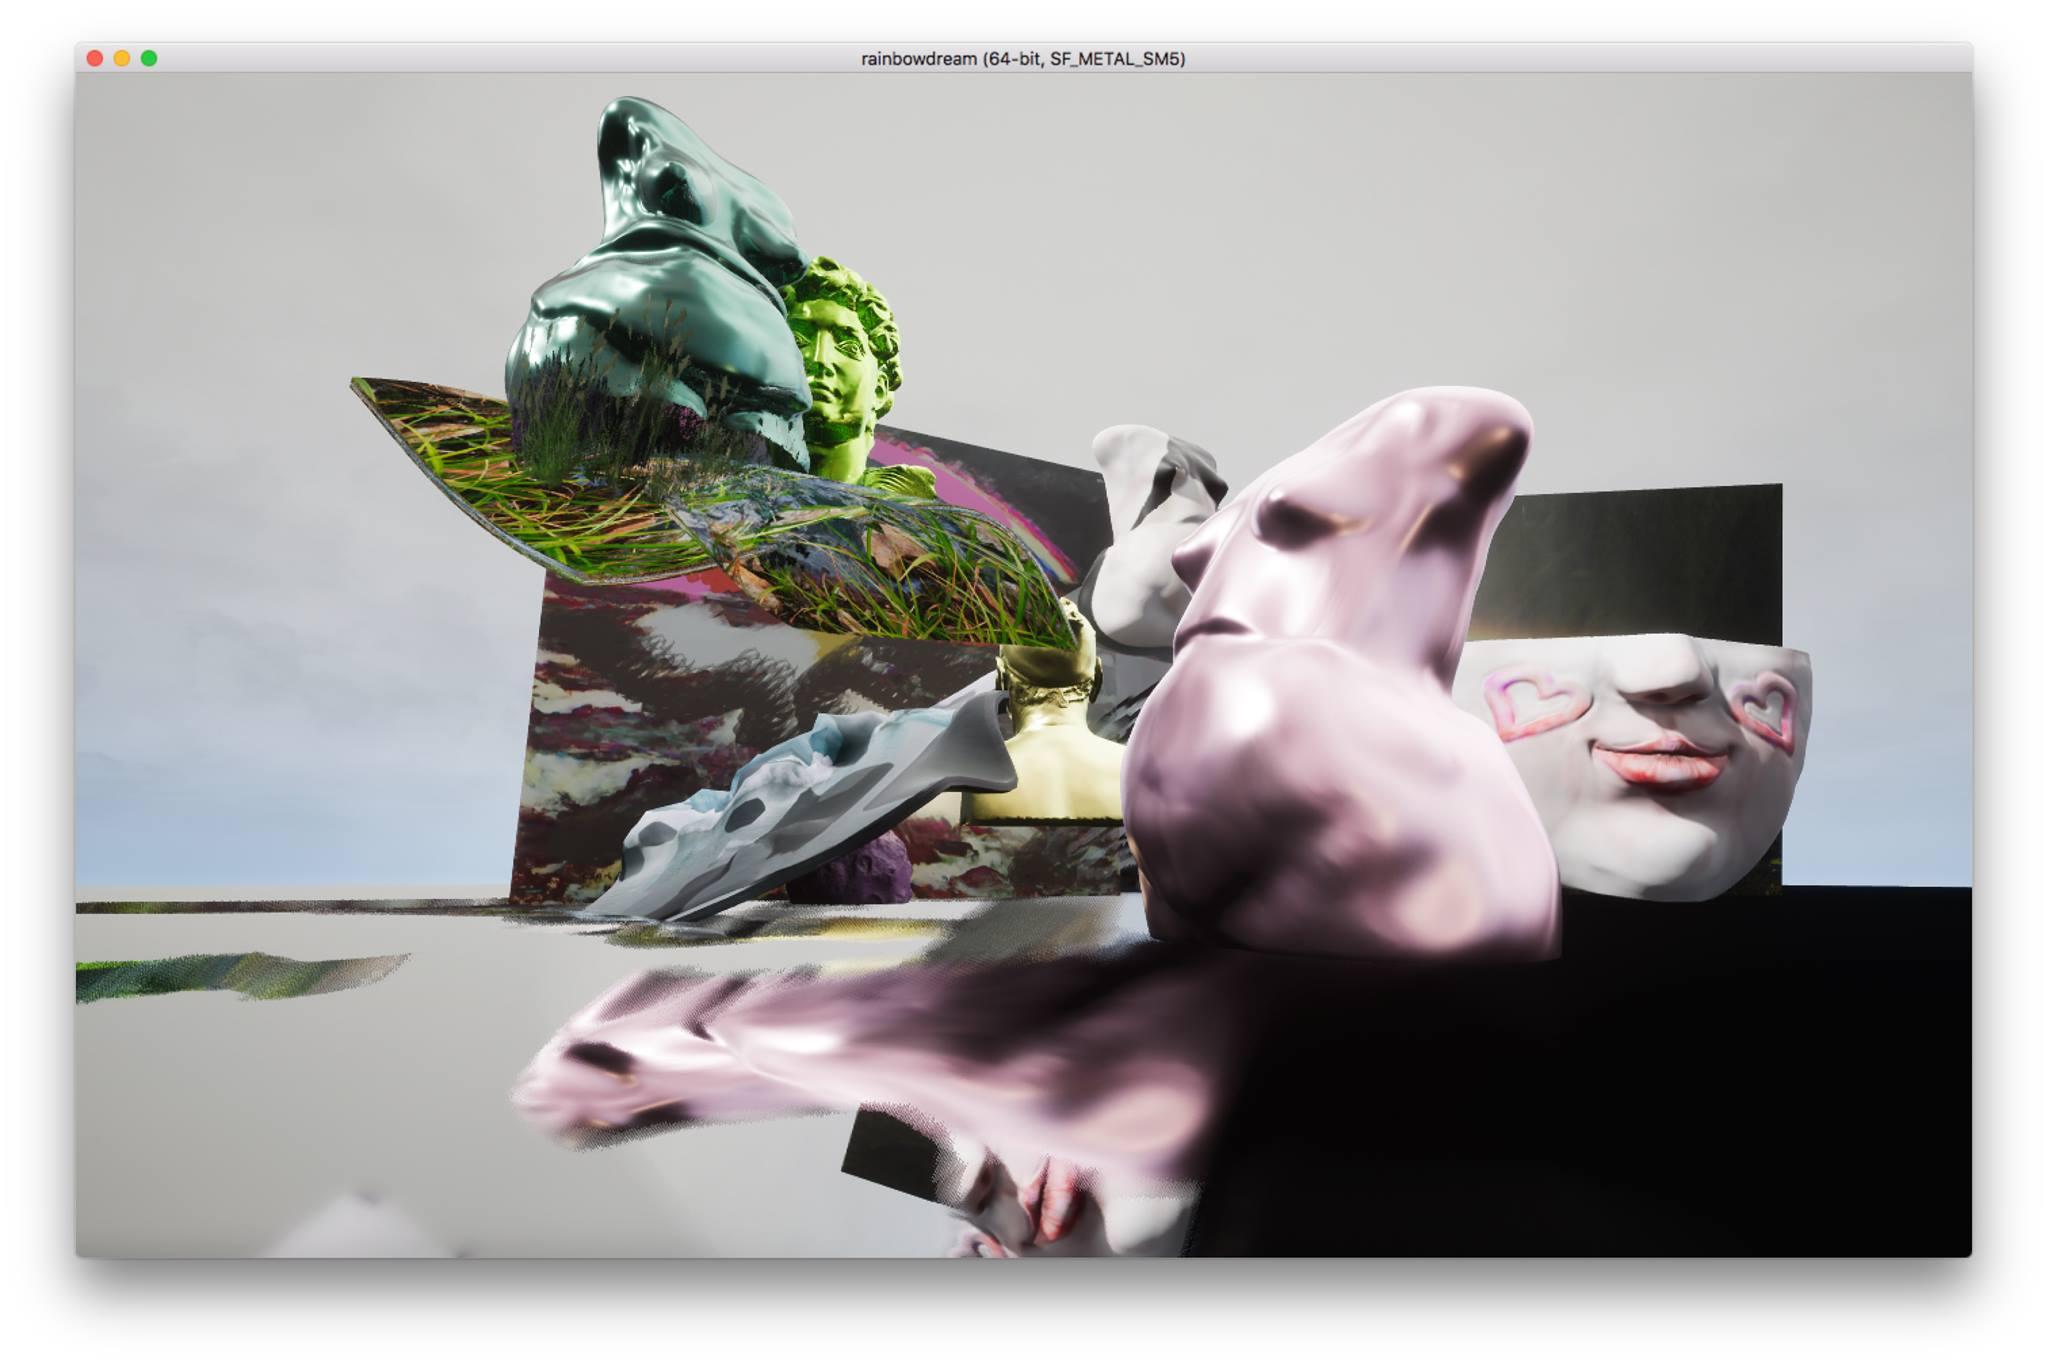 Kamilia Kard, Rainbowdream, ambiente navigabile, applicazione, 2017